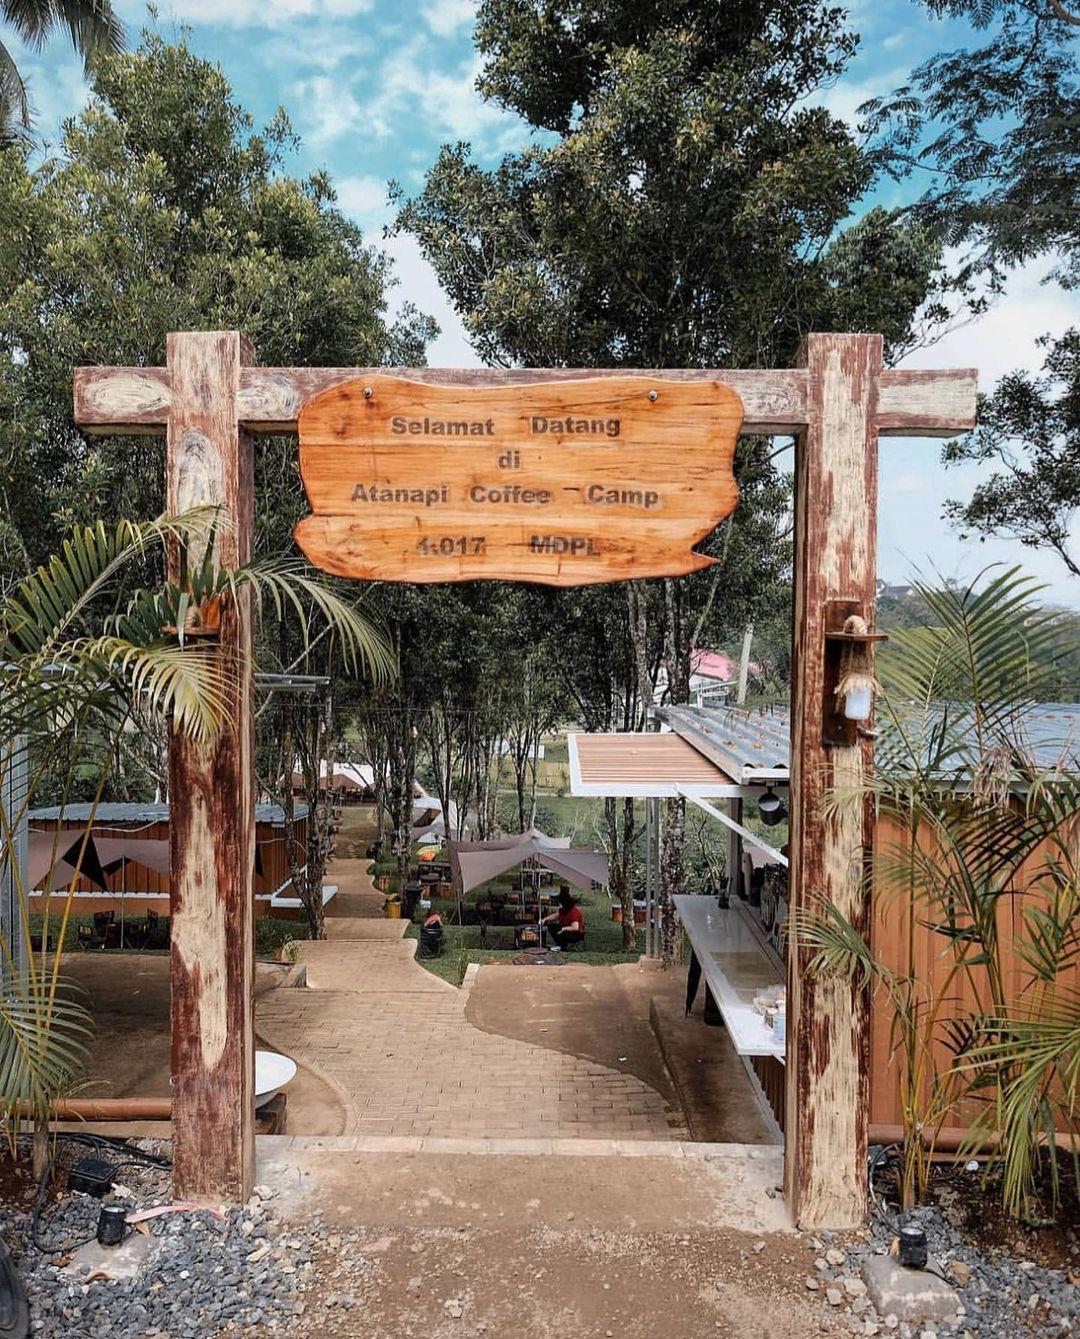 Gerbang Di Atanapi Coffee Camp Bandung Image From @mas_fotokopi